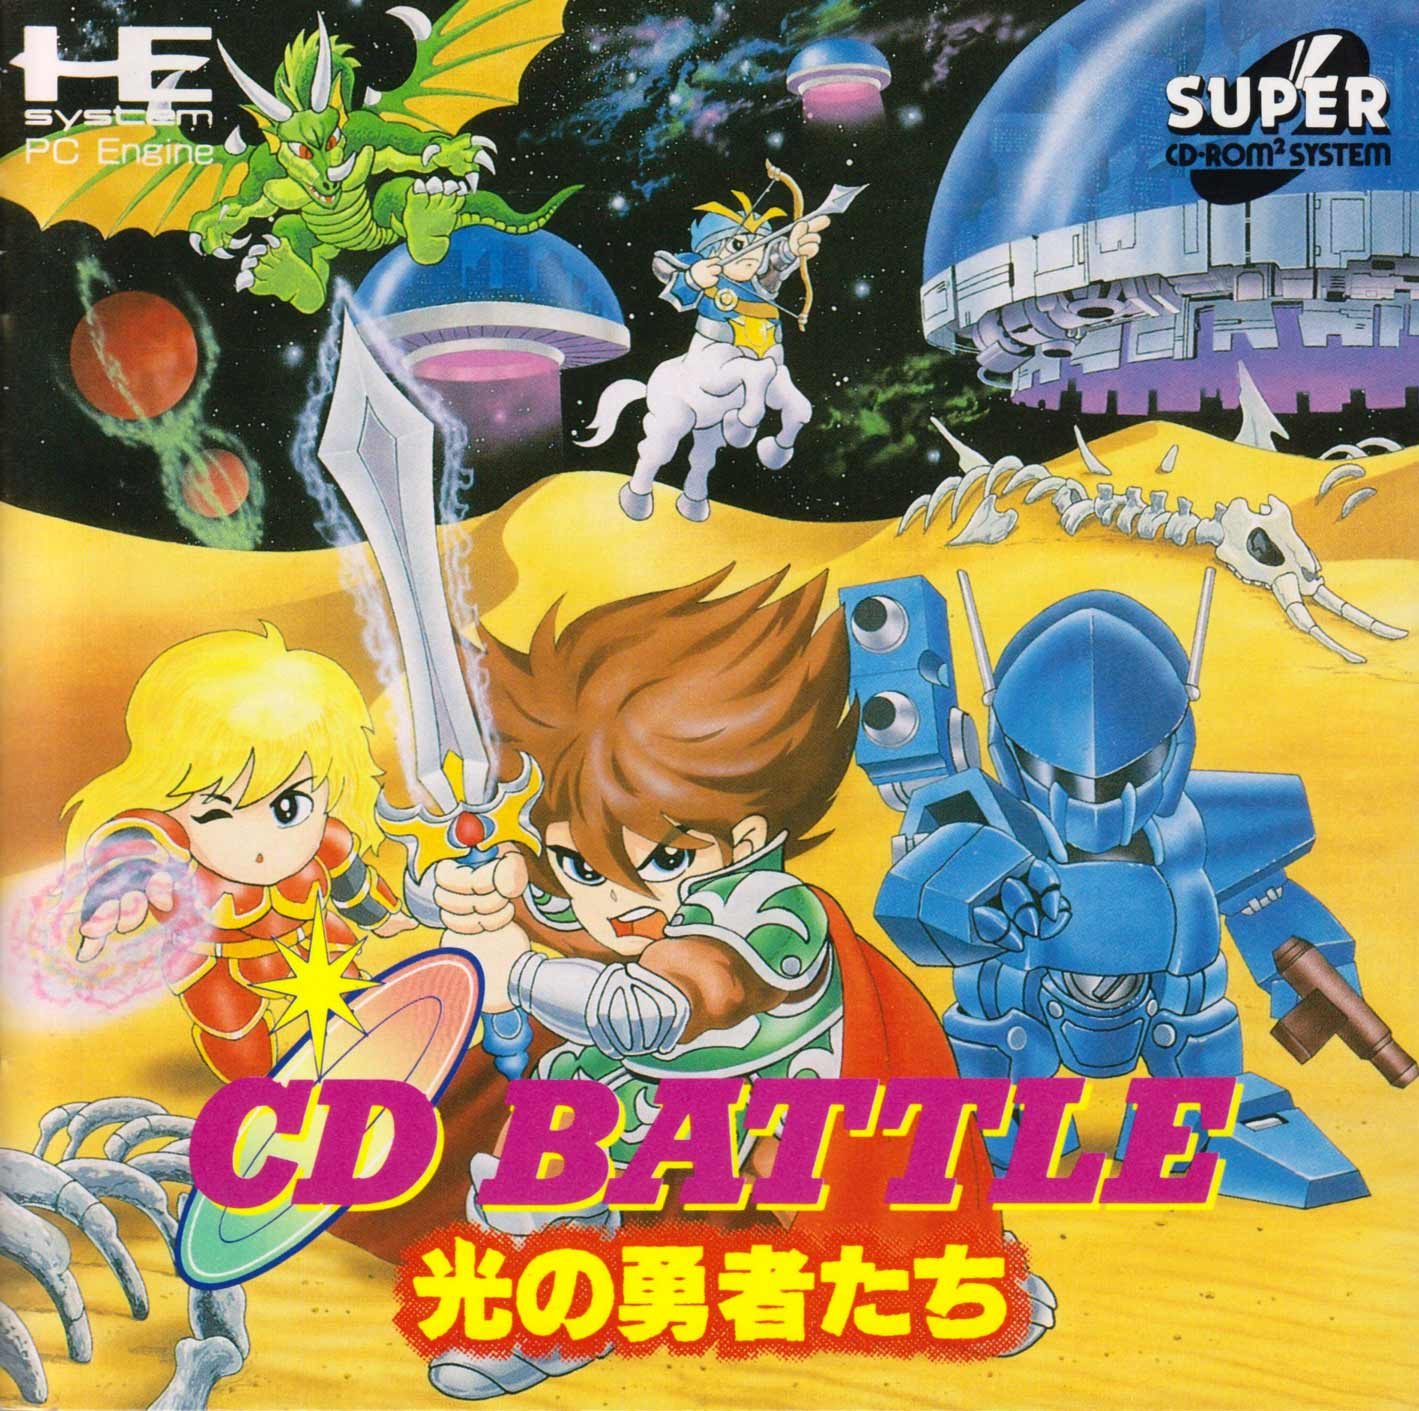 Jeu video CD Battle : Hikari no Yuushatachi sur PC-Engine CD Rom - 0